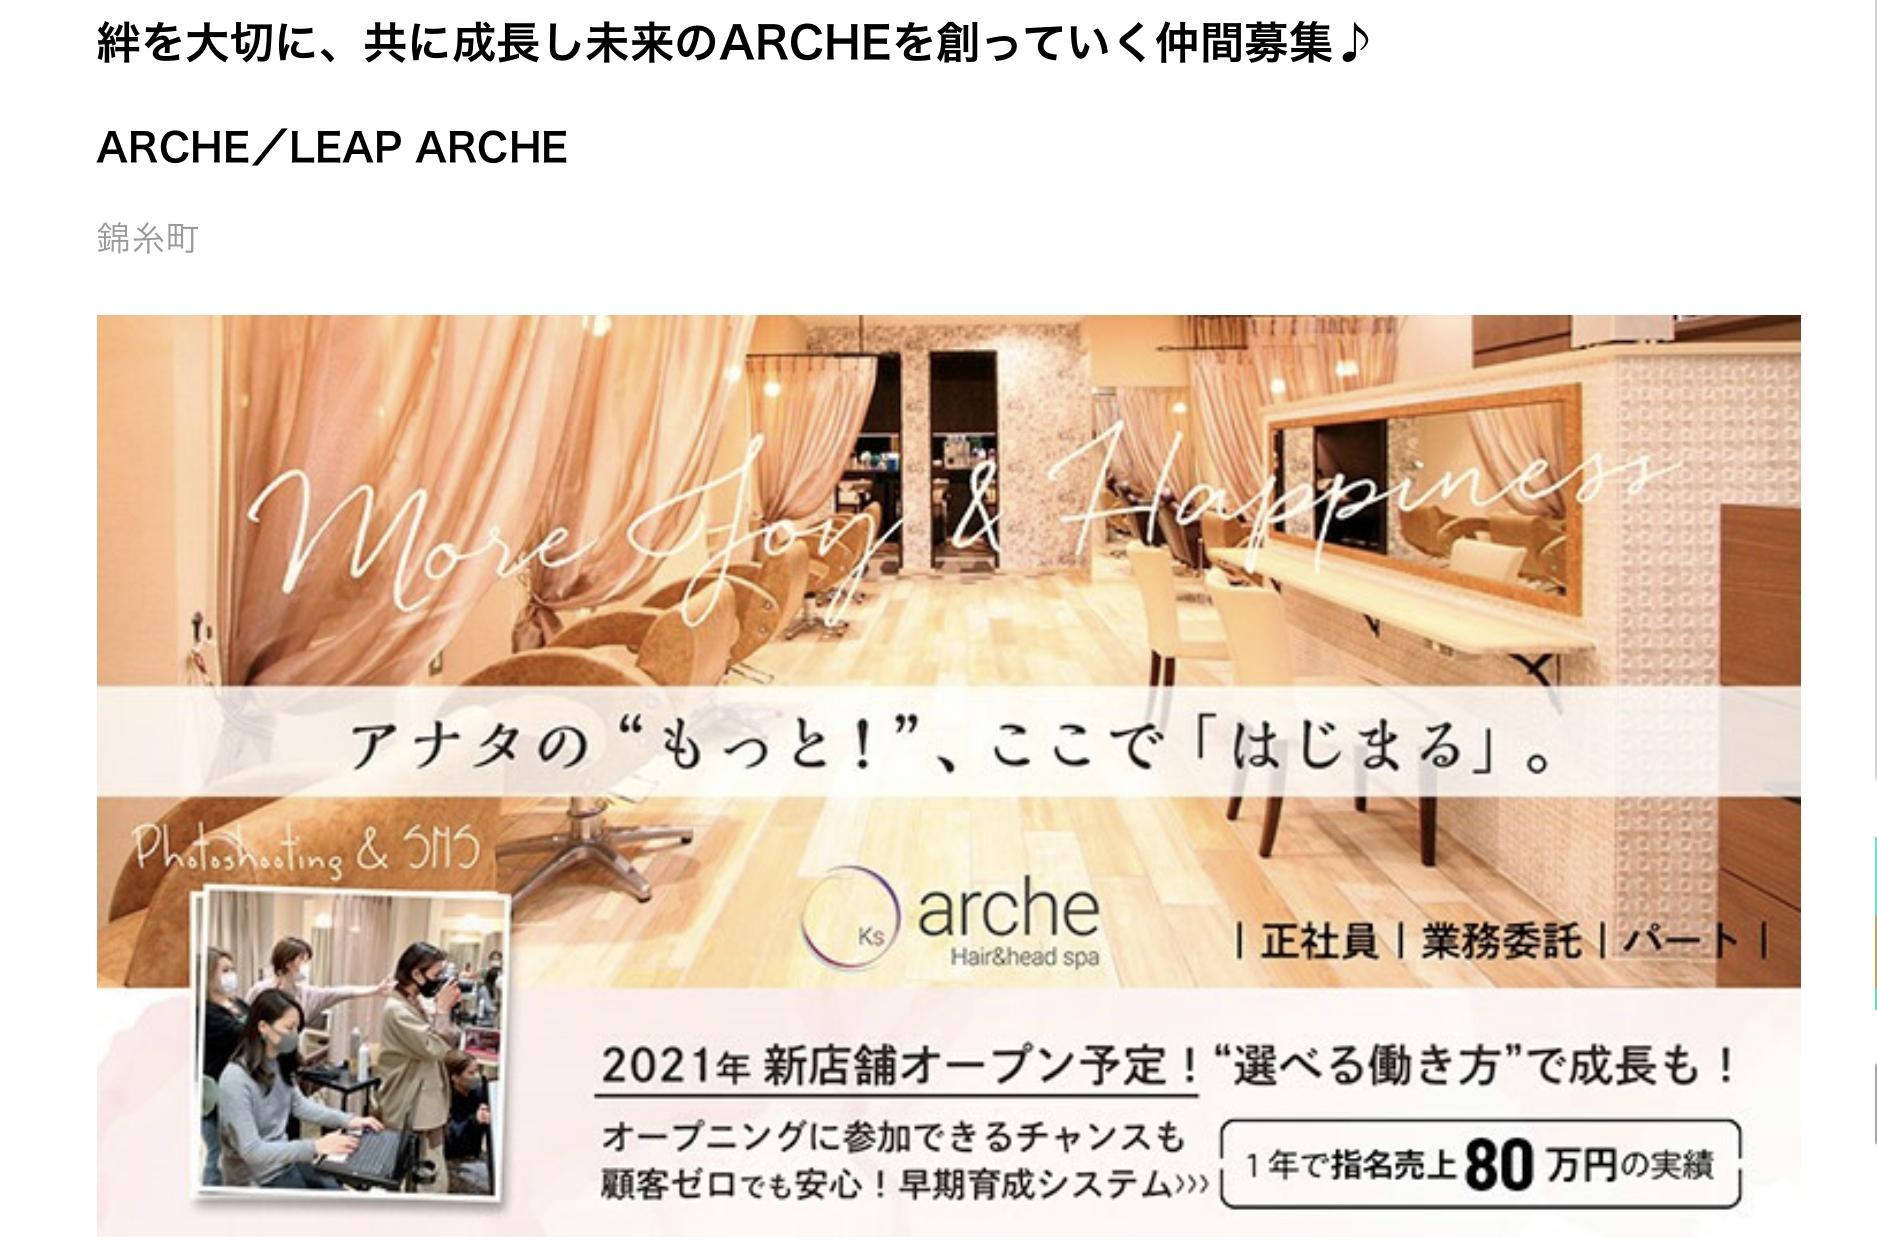 ARCHE錦糸町点⭐️アシスタント/スタイリスト募集❗️